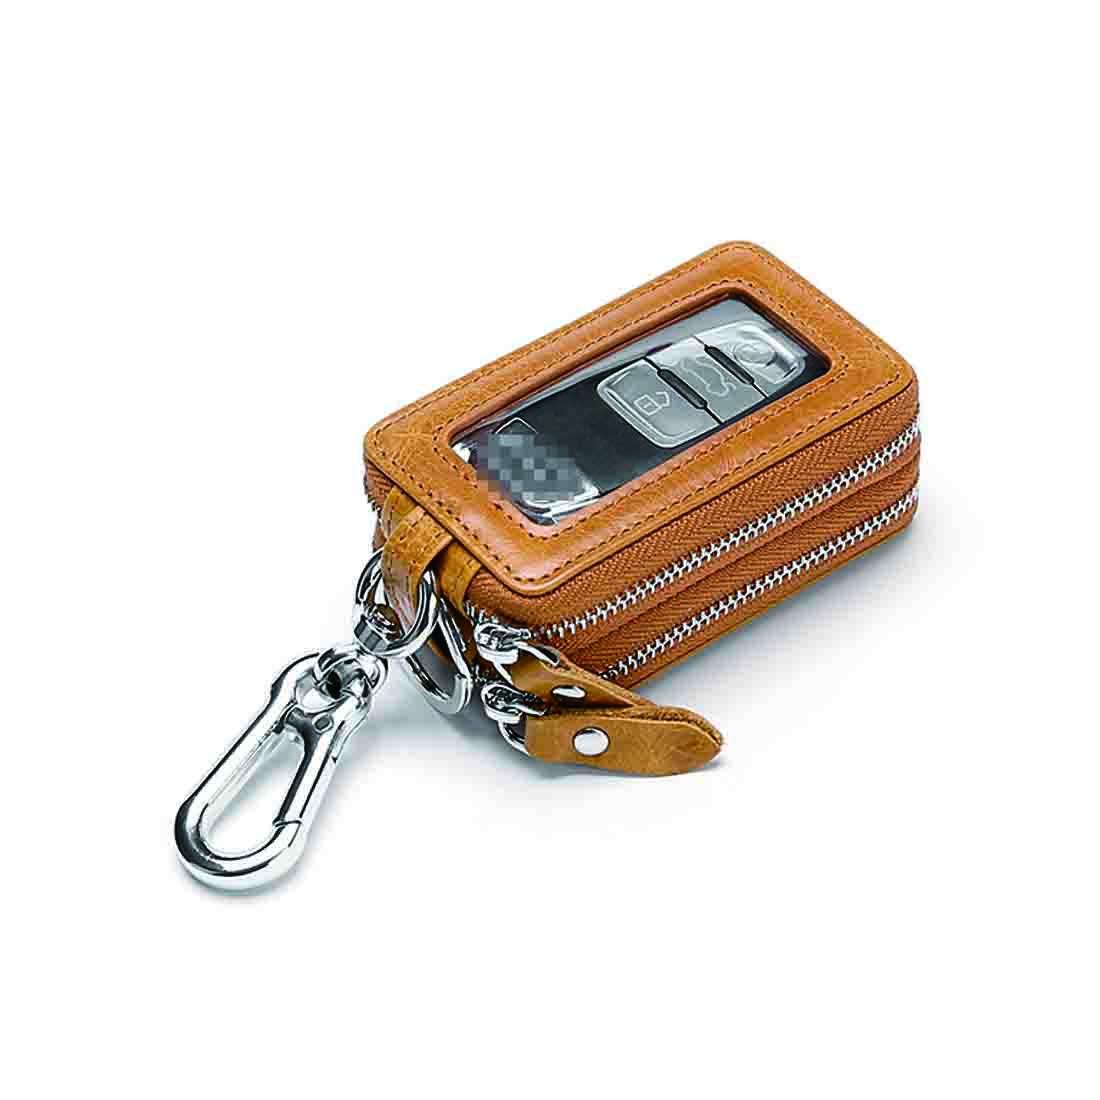 Unisex Key Holder Case Leather Keychain Pouch Bag Car Wallet Key Ring 6A